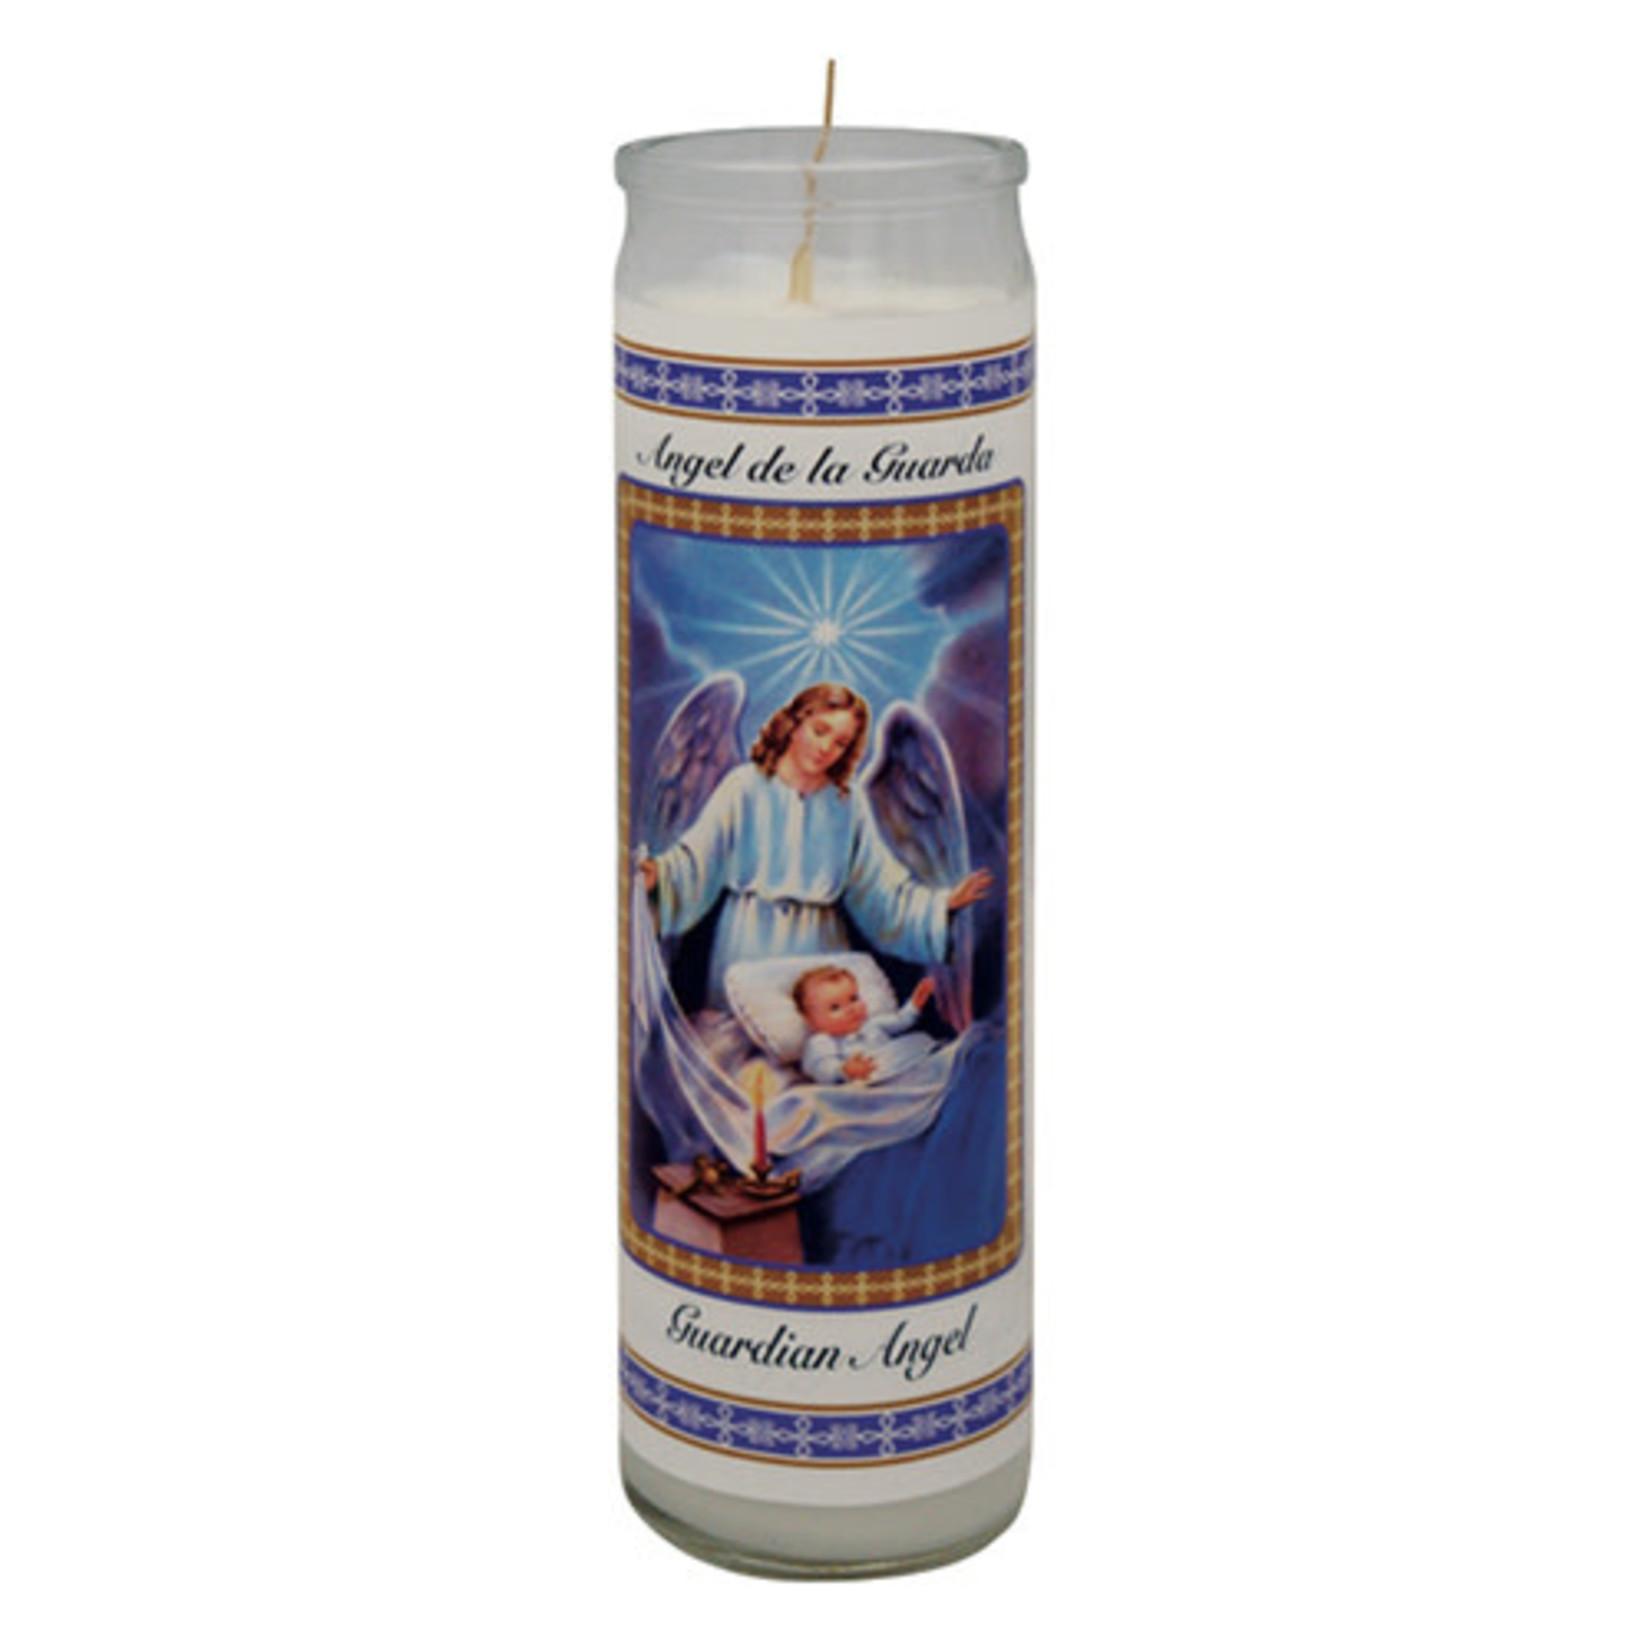 36 Hours Candle Guardian Angel - ANGEL DE LA GUARDA